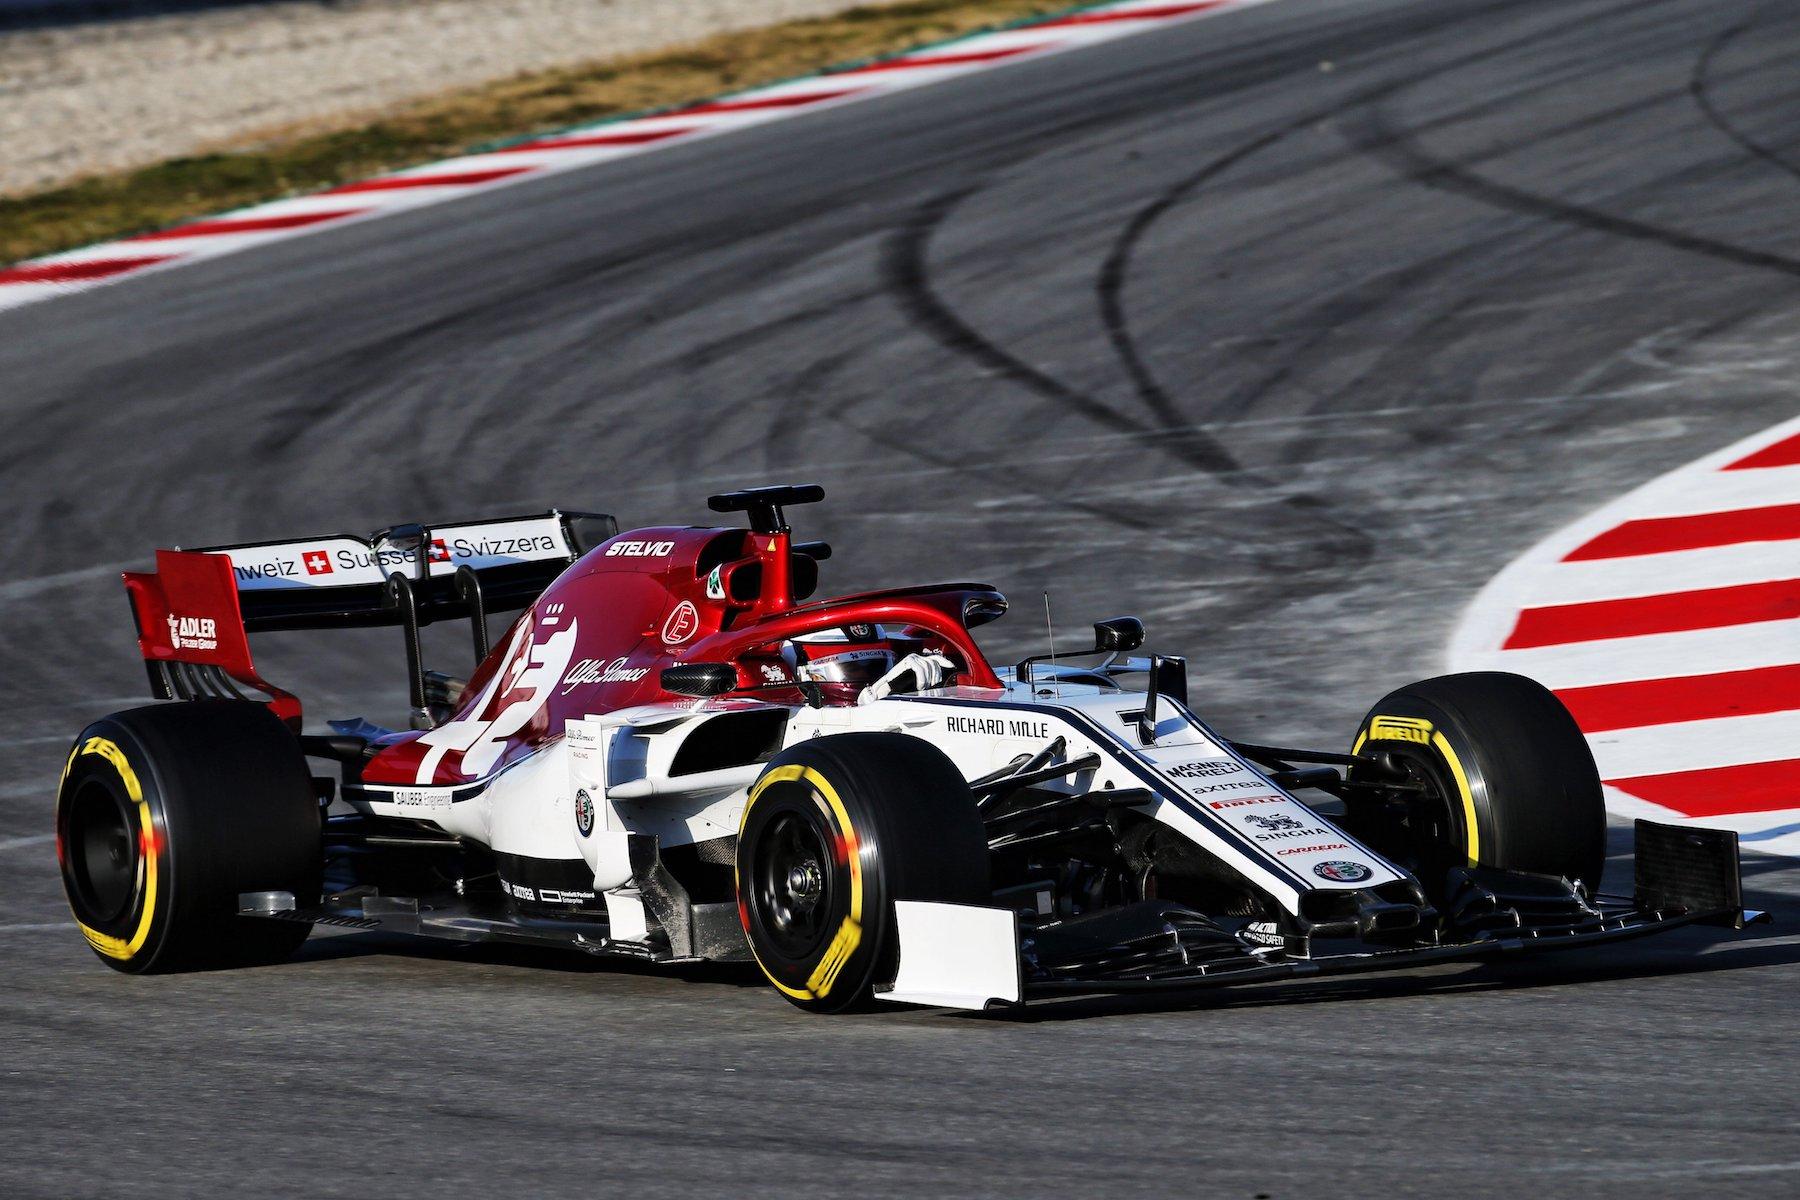 2019 Kimi Raikkonen   Alfa Romeo C38   2019 Barcelona T1 D3 9 copy.jpg